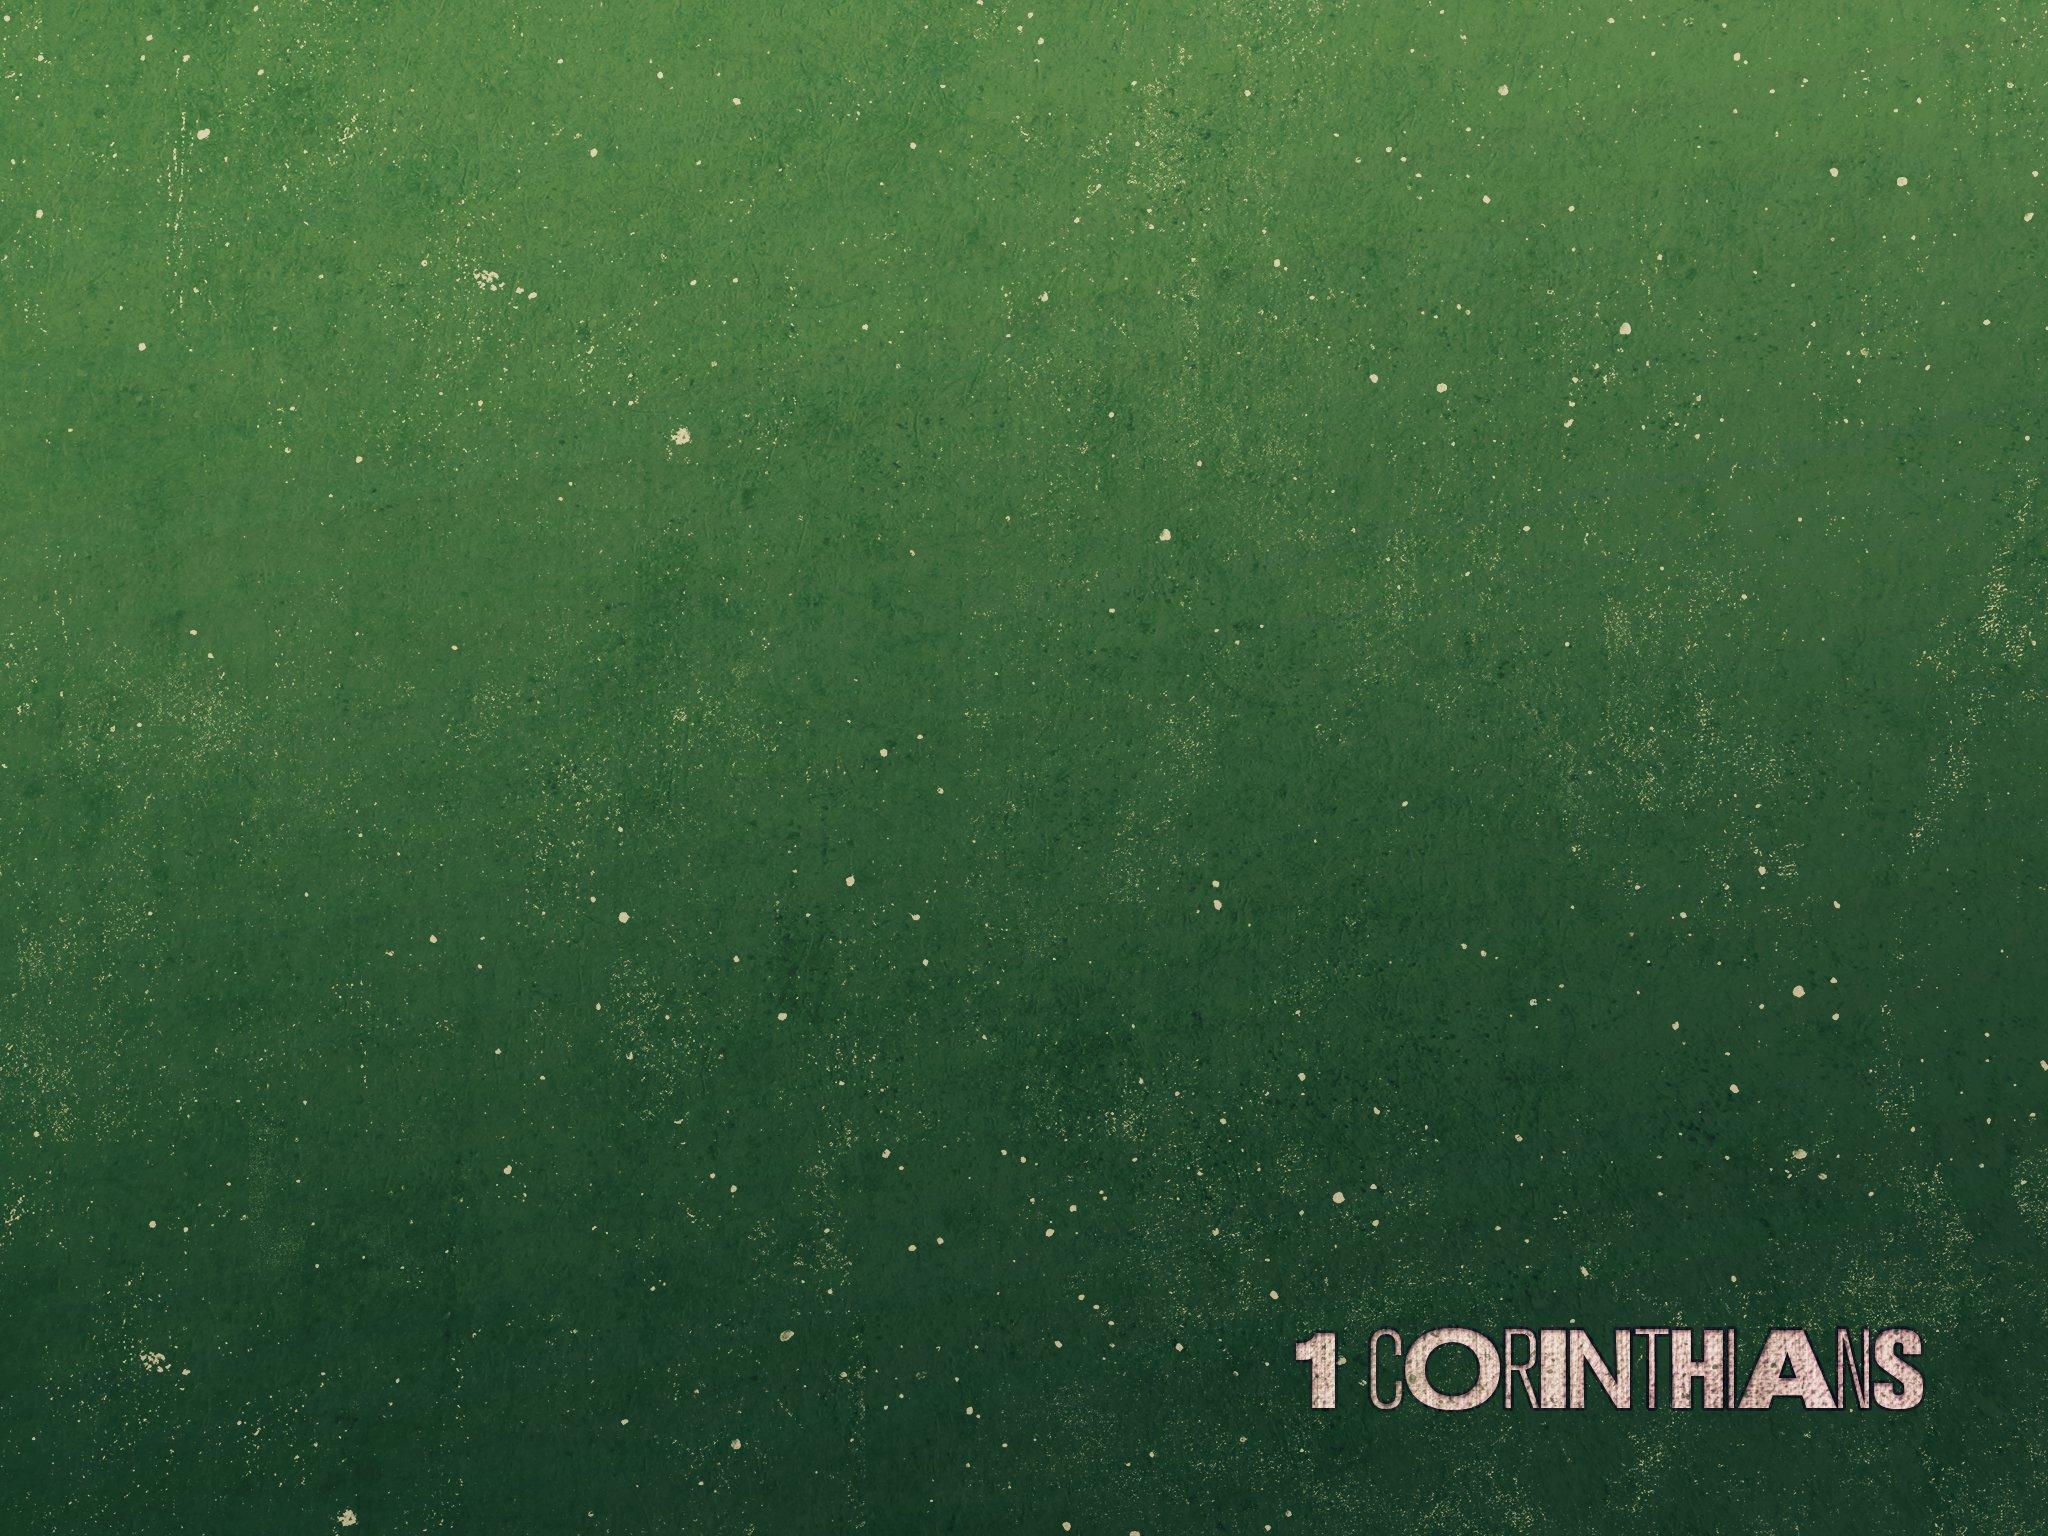 46-1-Corinthians_Secondary_4x3-fullscreen.jpg